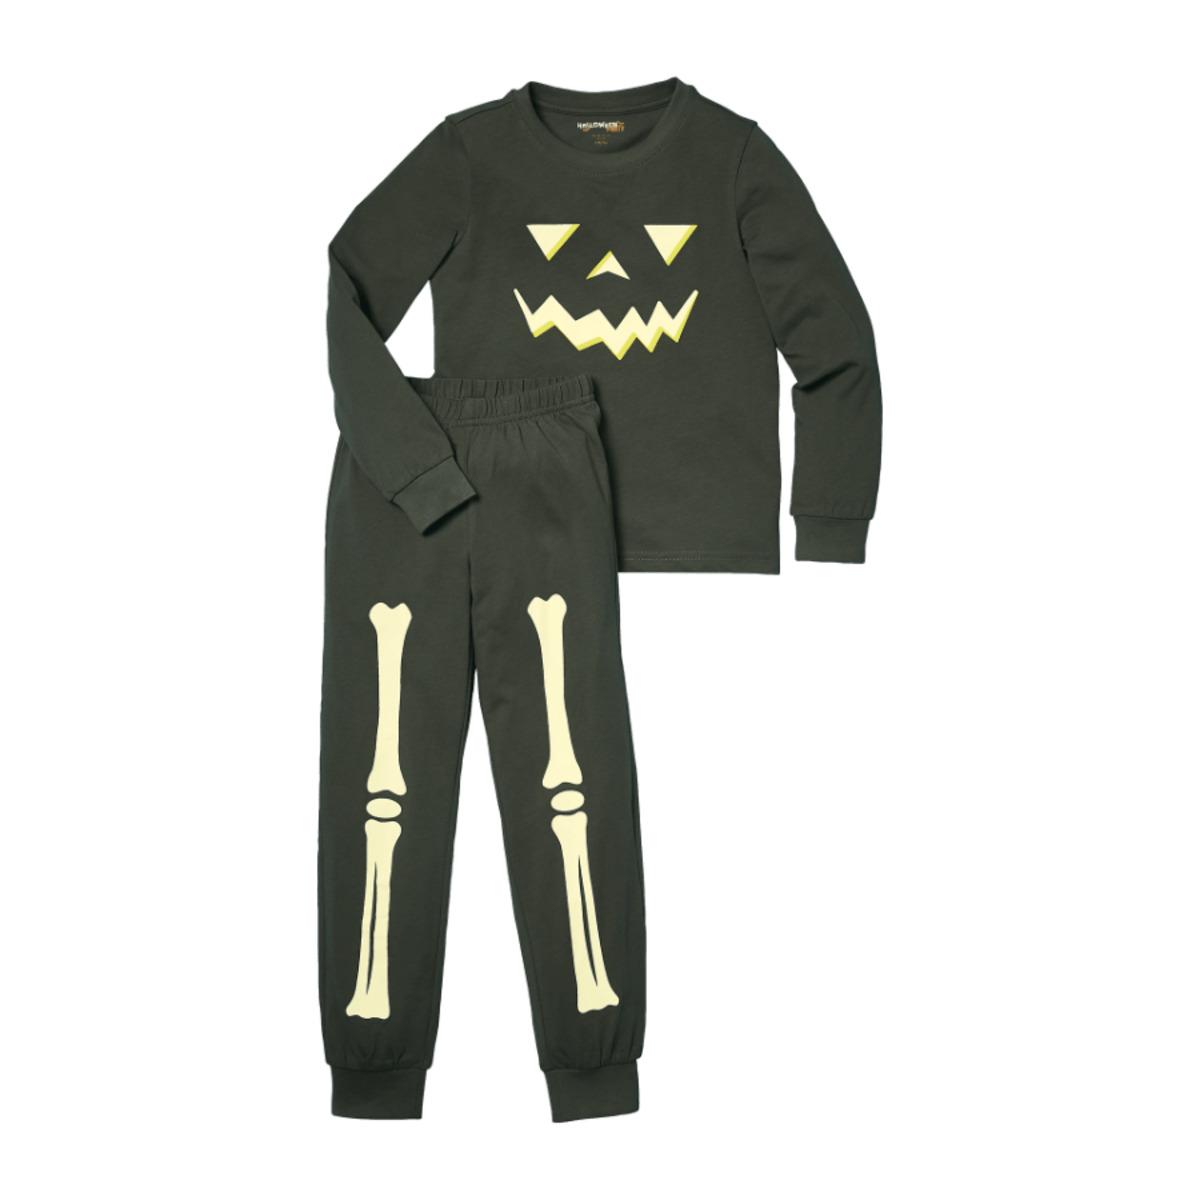 Bild 4 von POCOPIANO     Halloween-Pyjama, glow in the dark